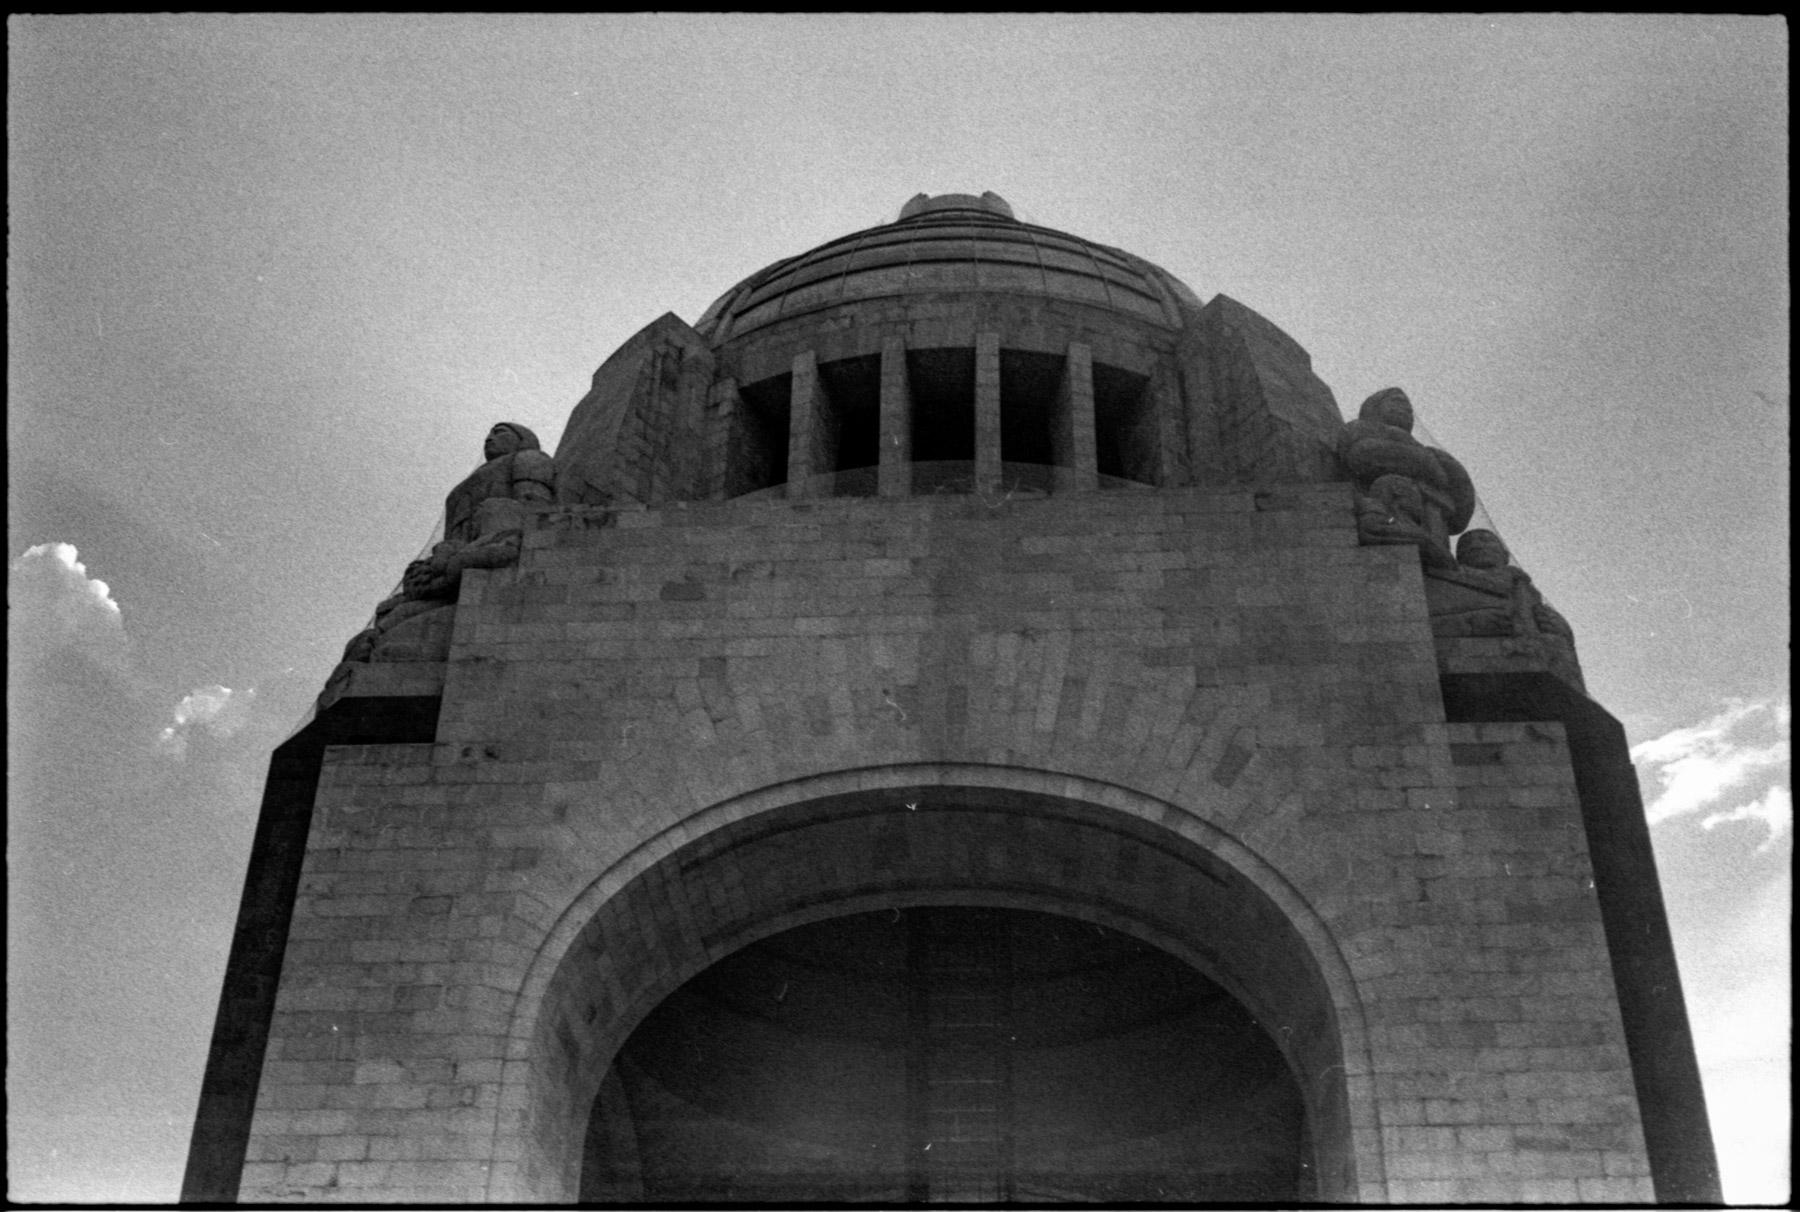 Ilford HP5 400 35mm film shot by Luis Mendoza (@luismendozamx) on the Olympus 35SP